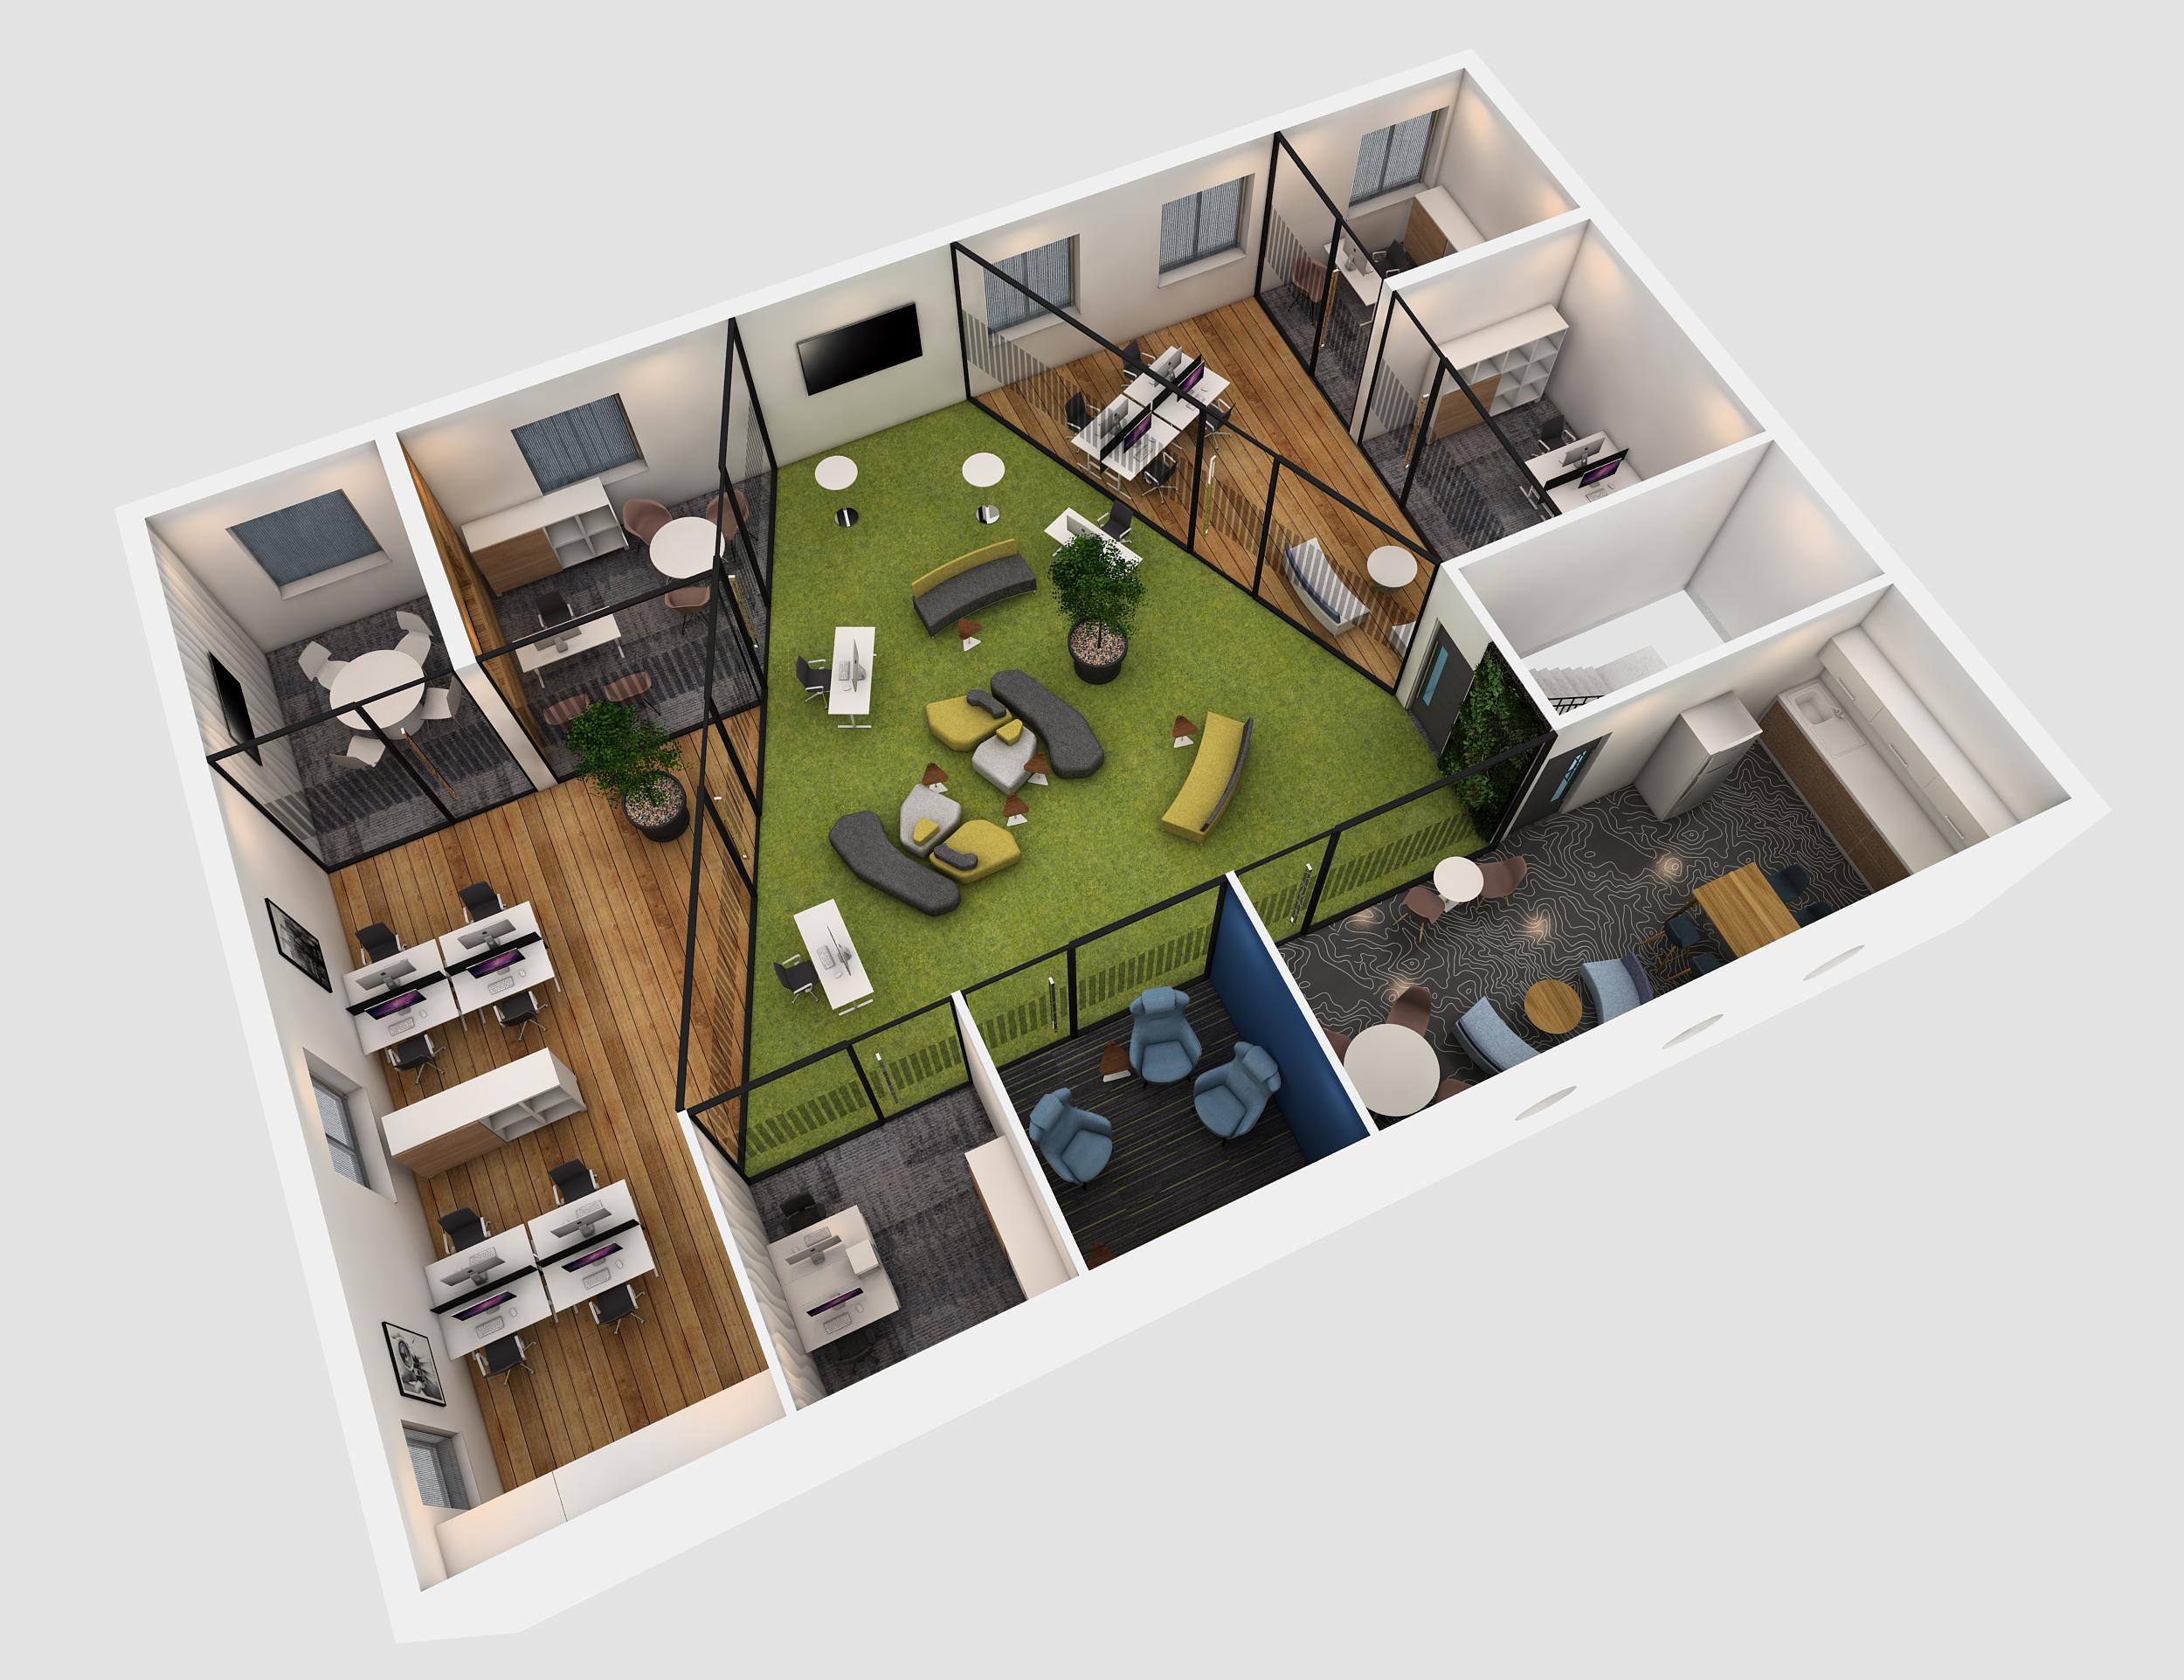 interior-design-project-in-progress-3.jpg